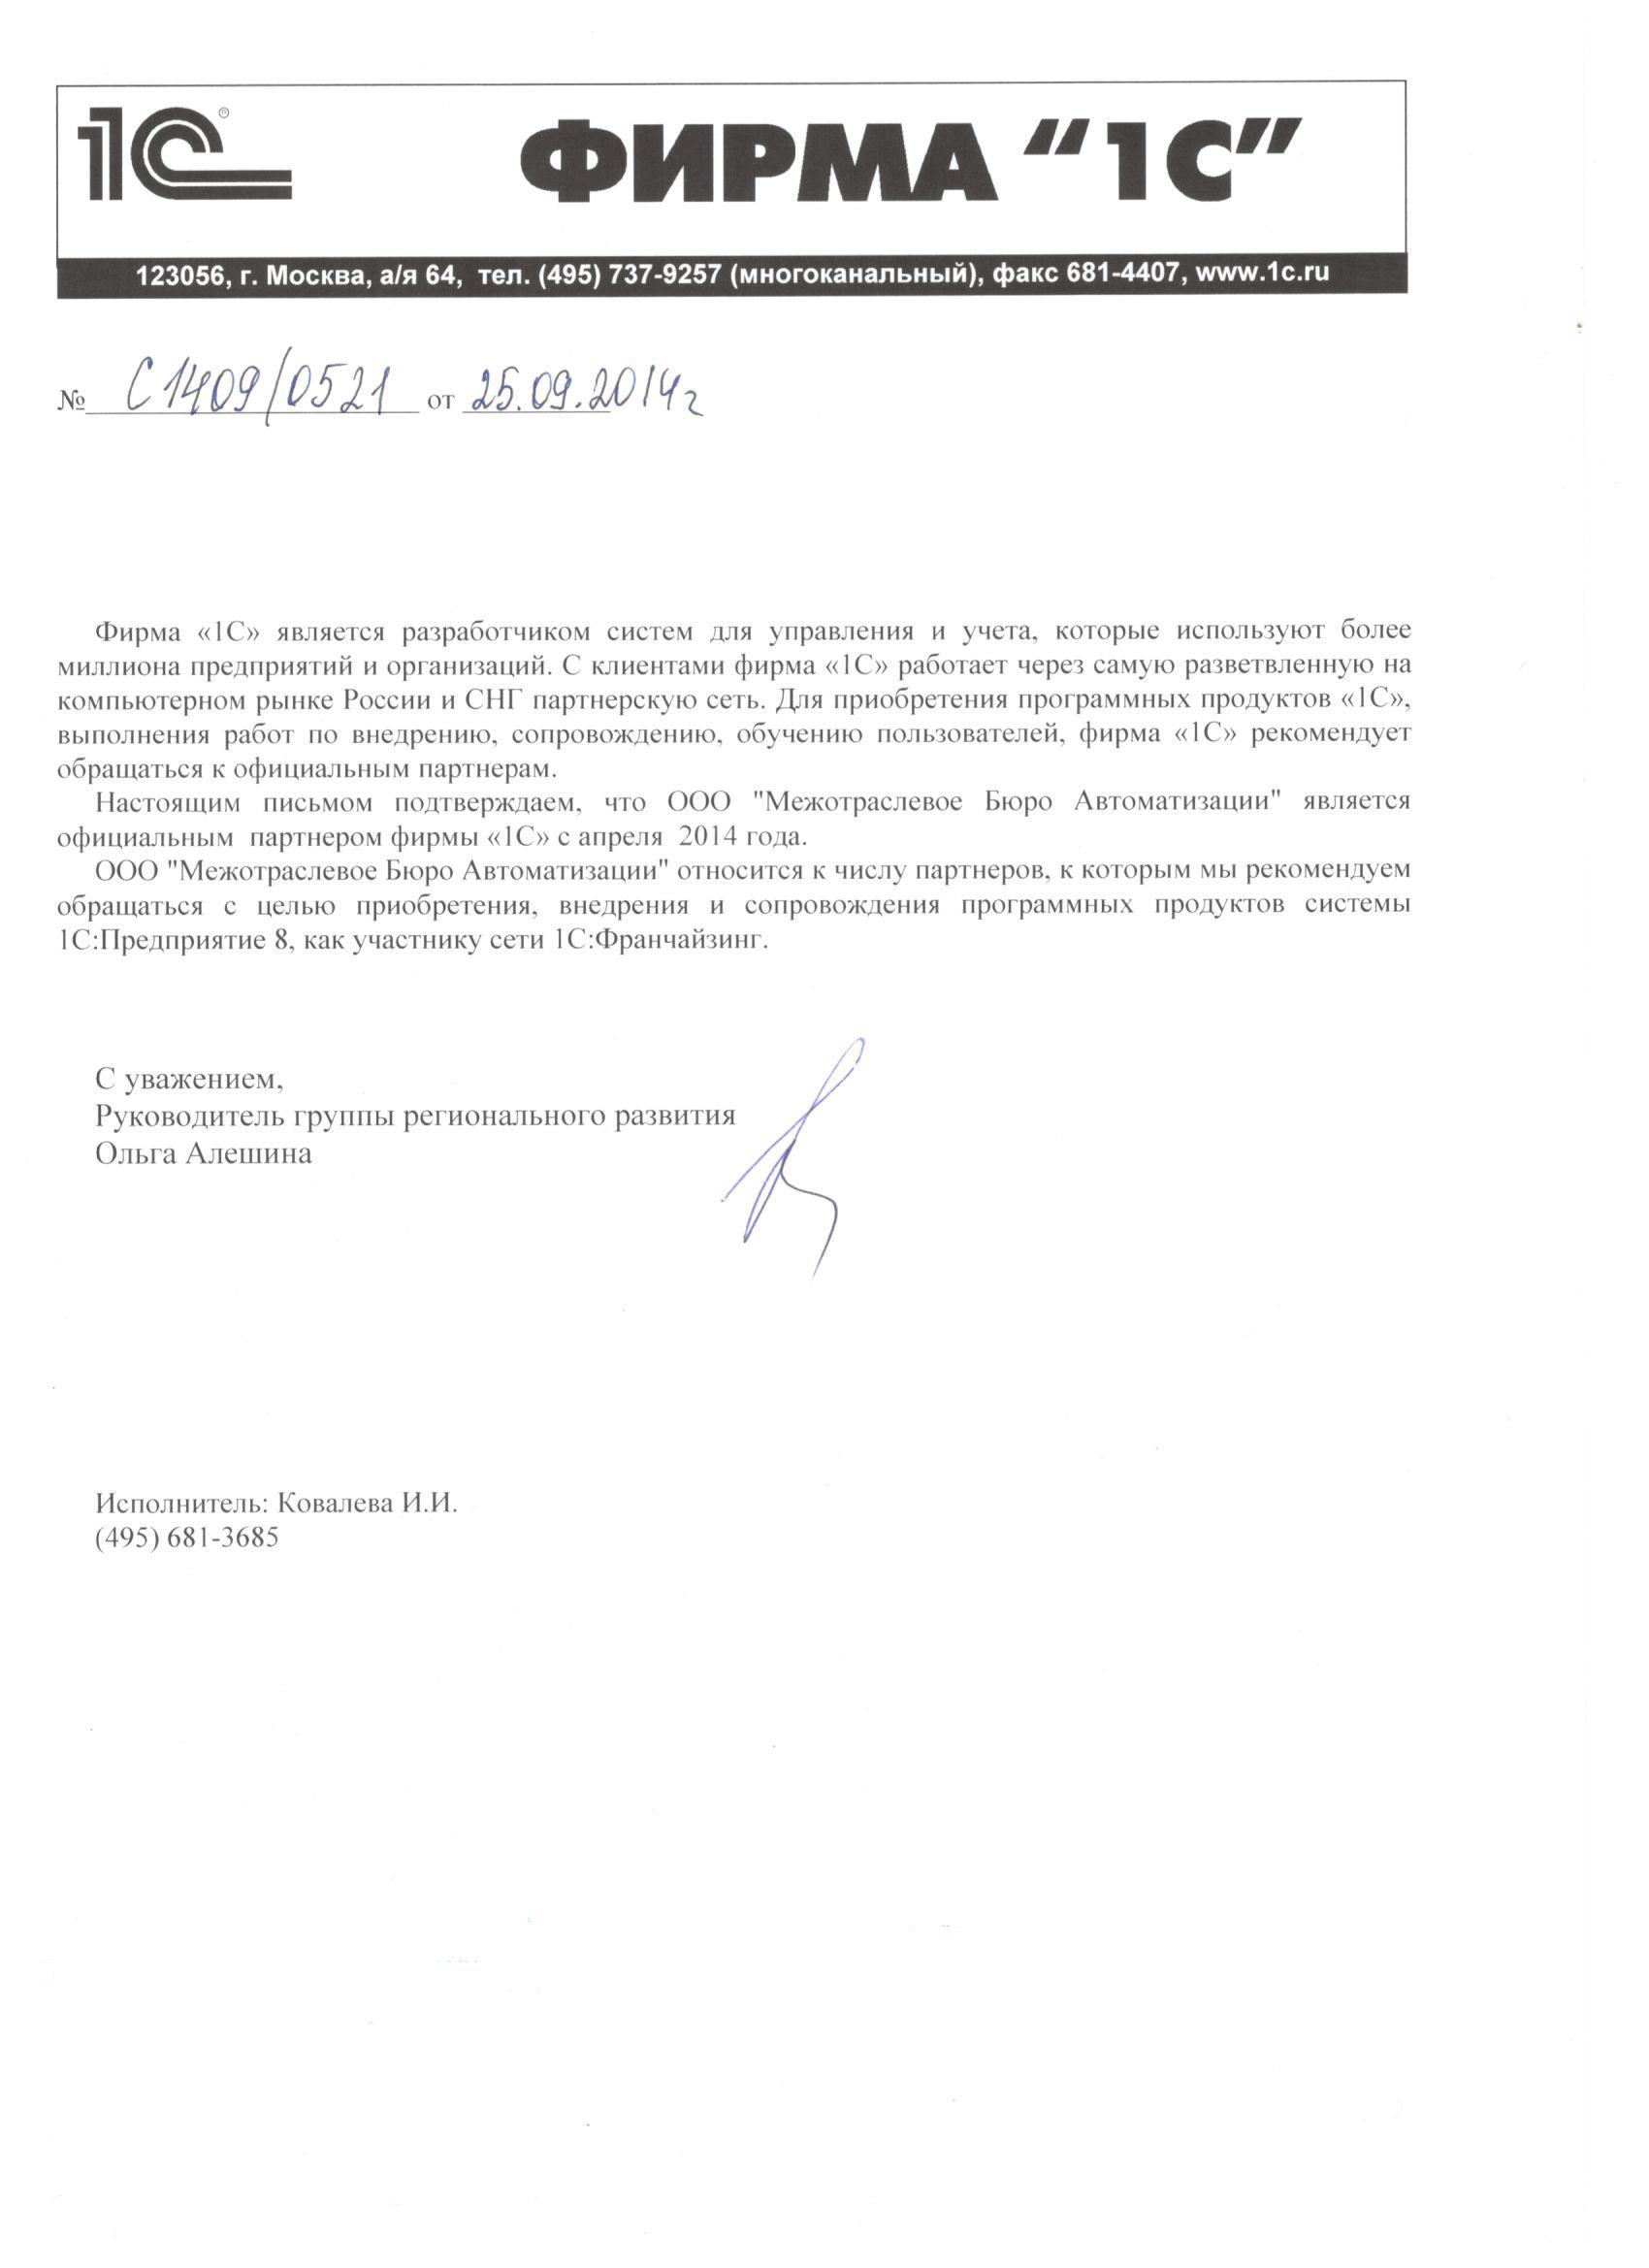 Letter_partnership